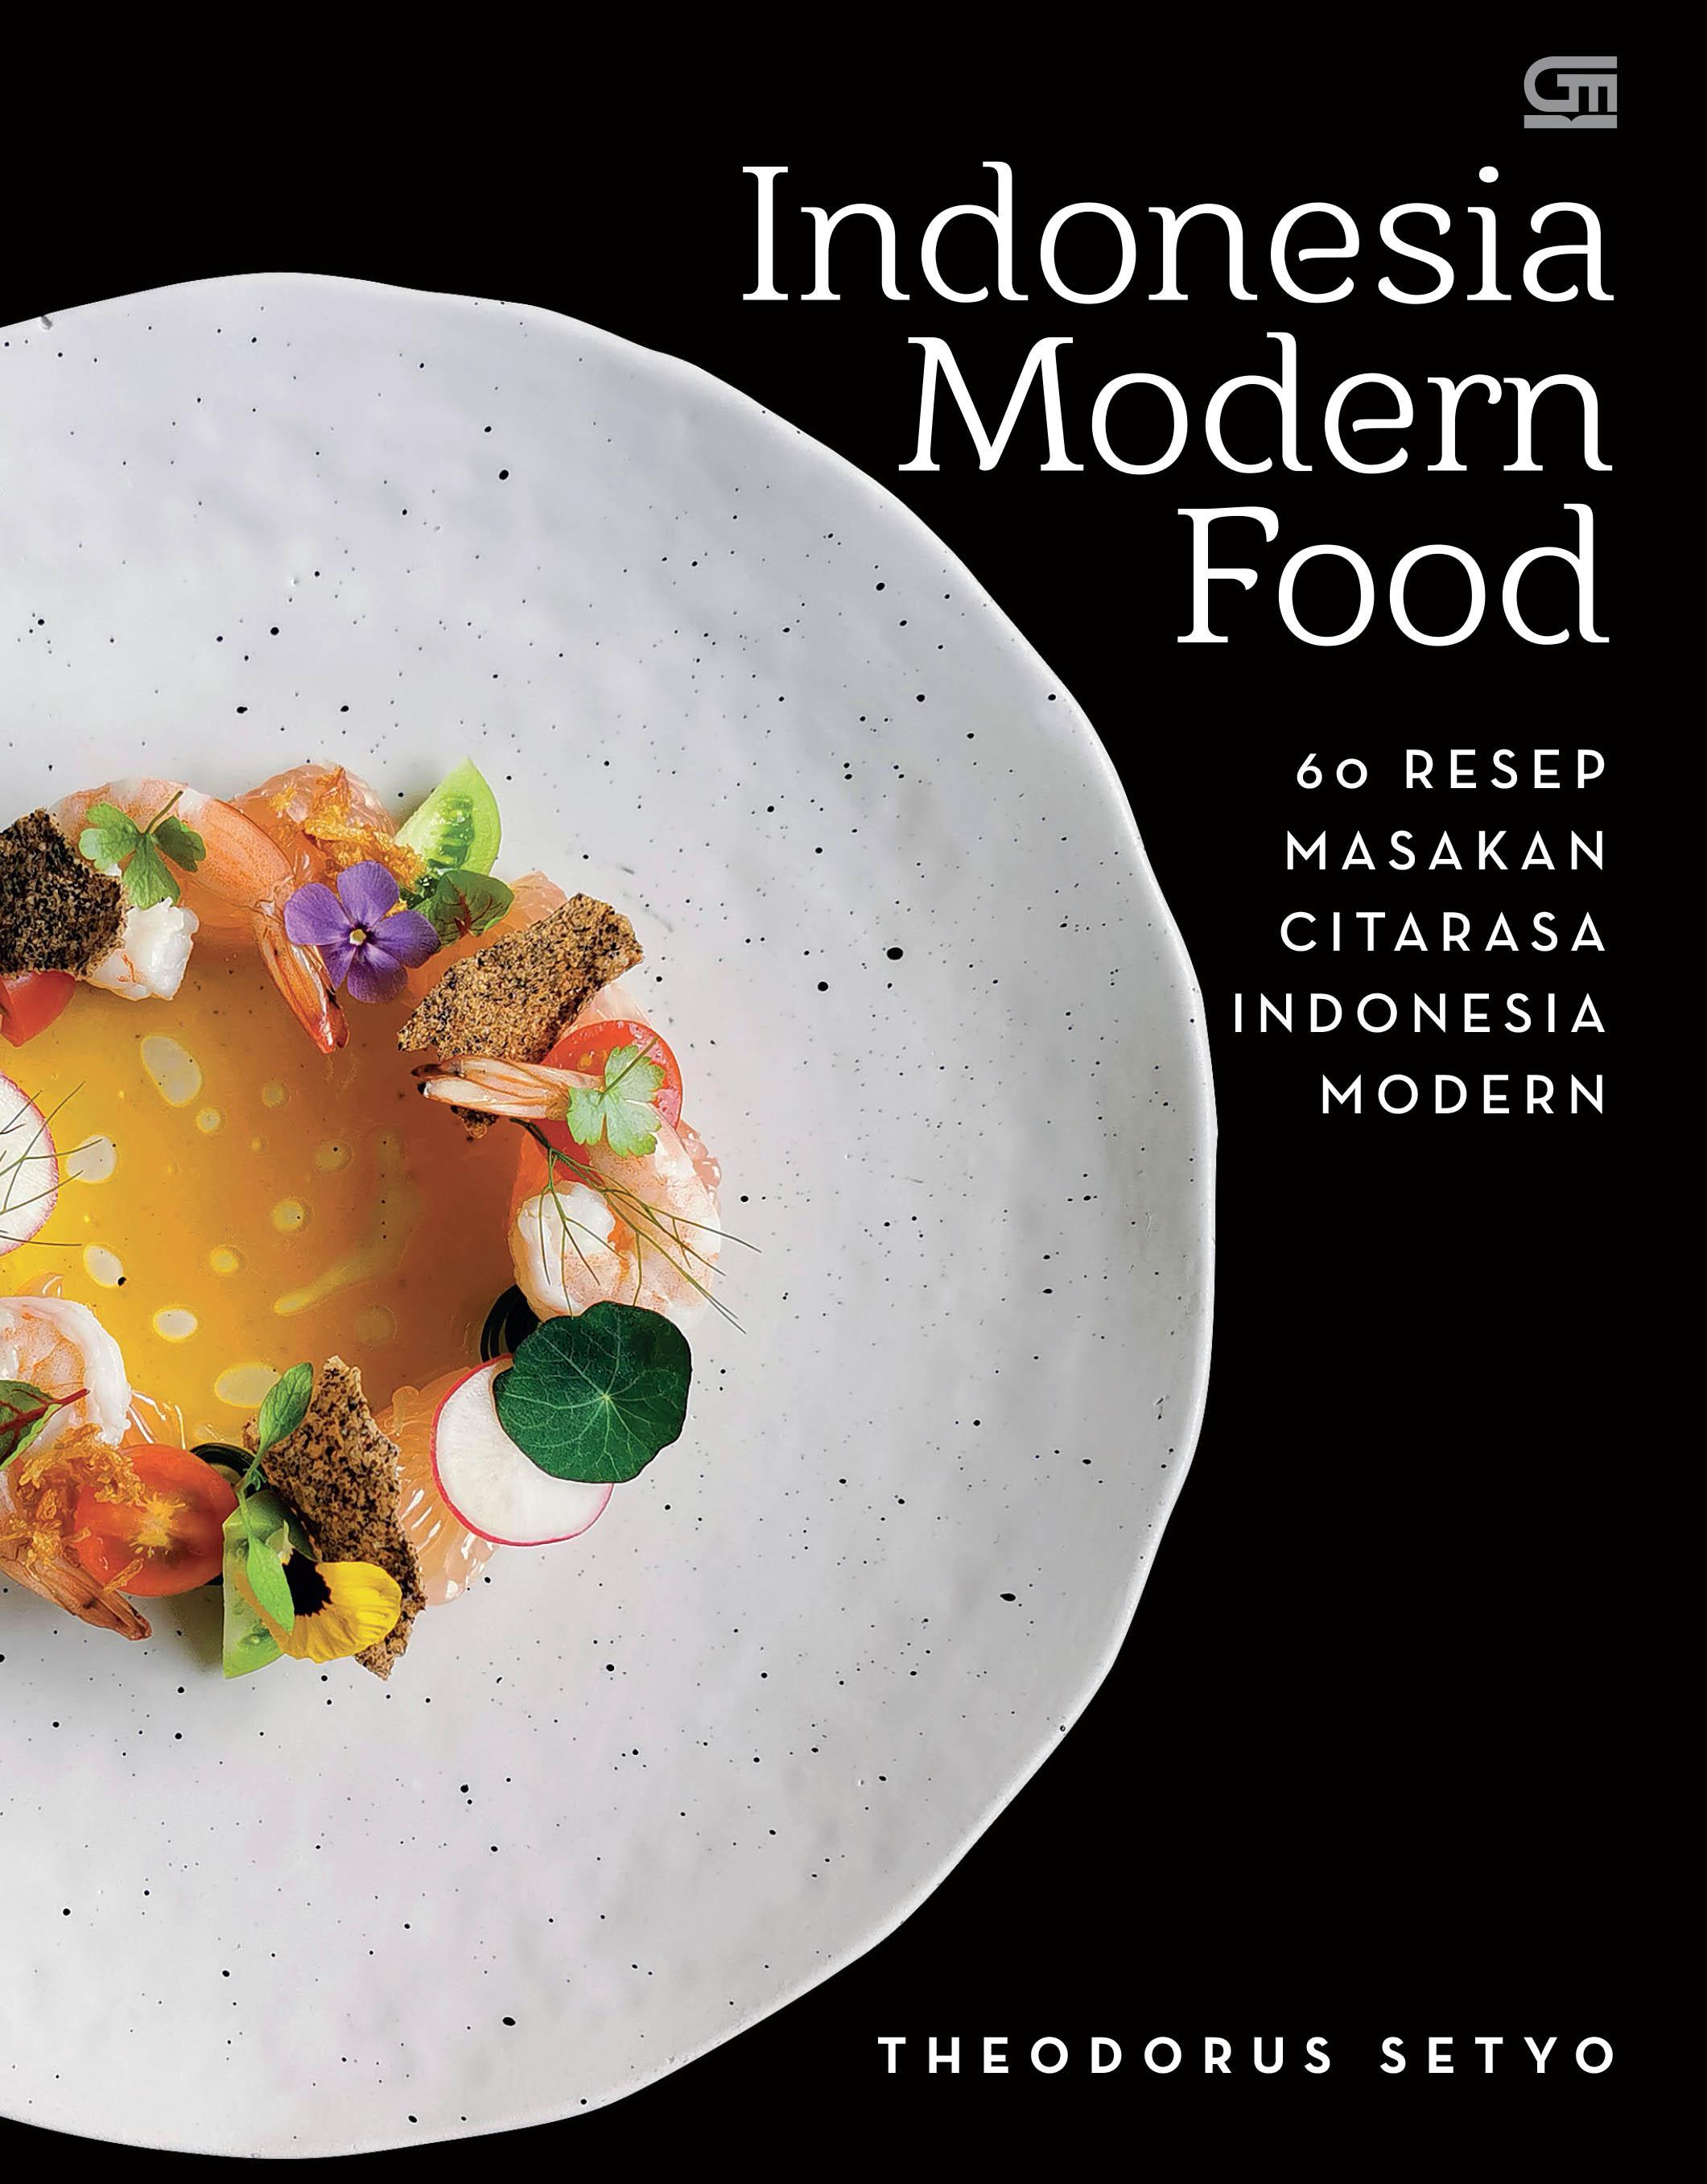 Indonesian Modern Food: 60 resep Masakan Citarasa Indonesia Modern